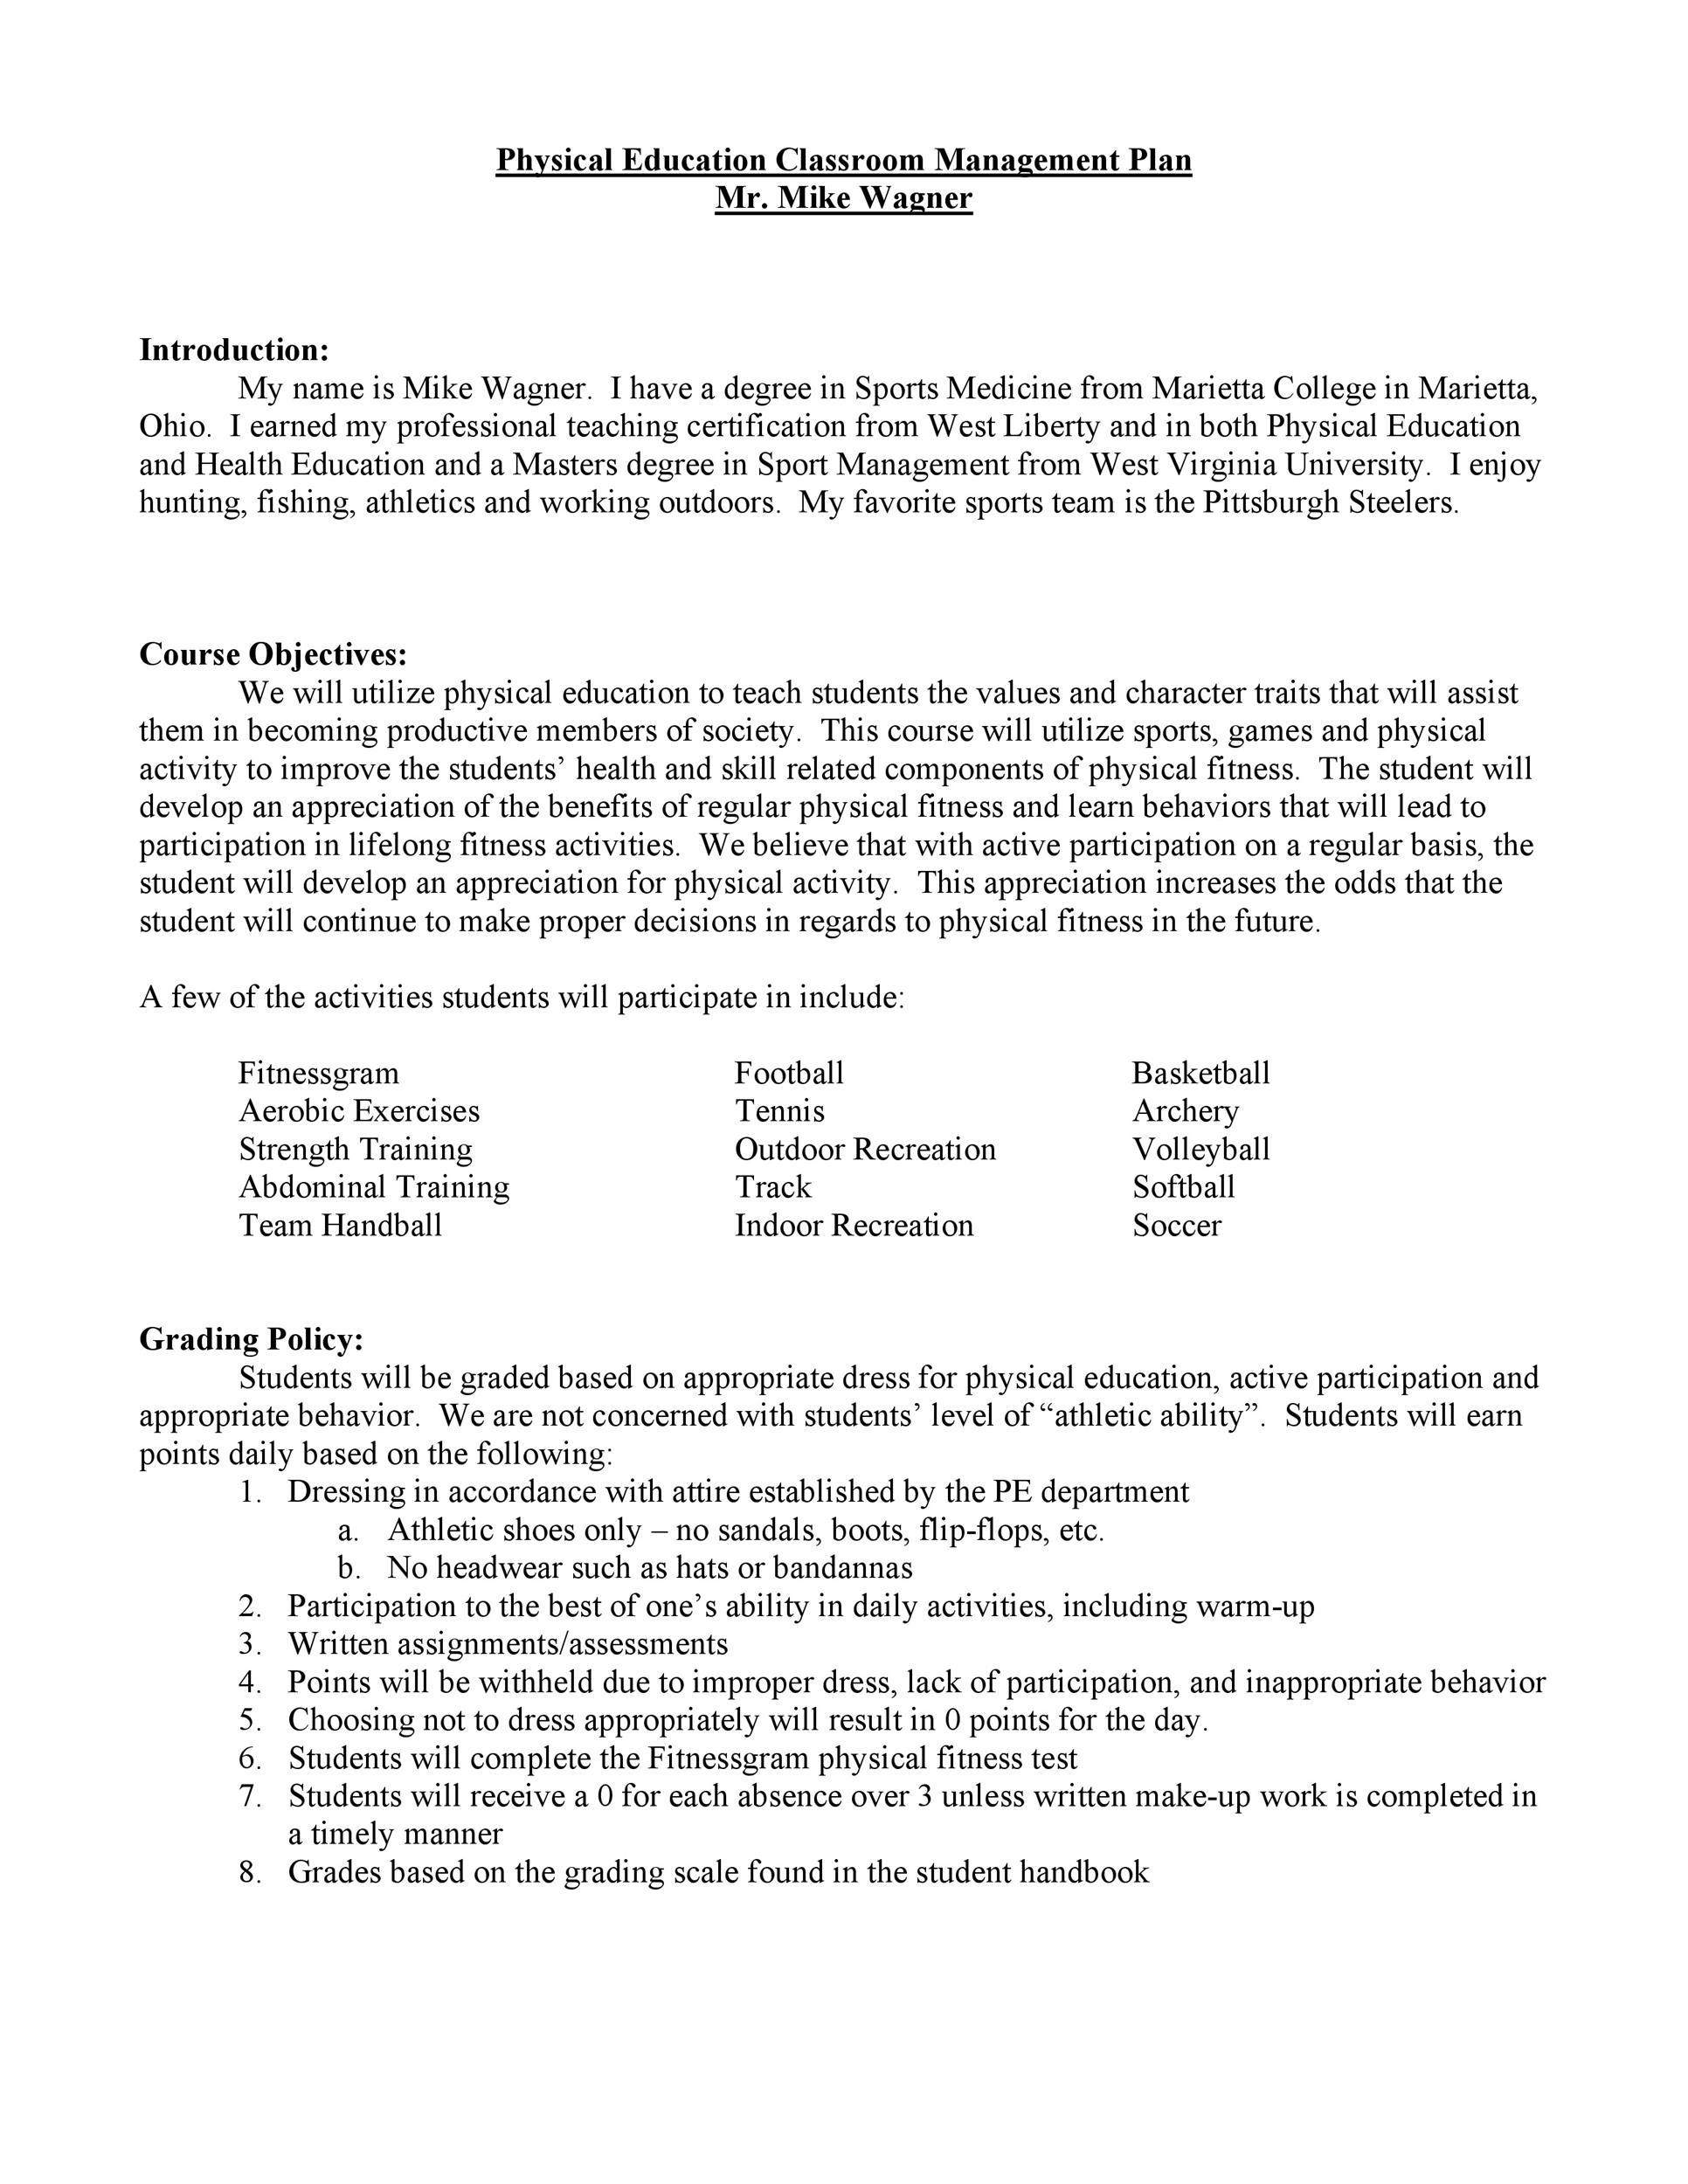 Free classroom management plan 16